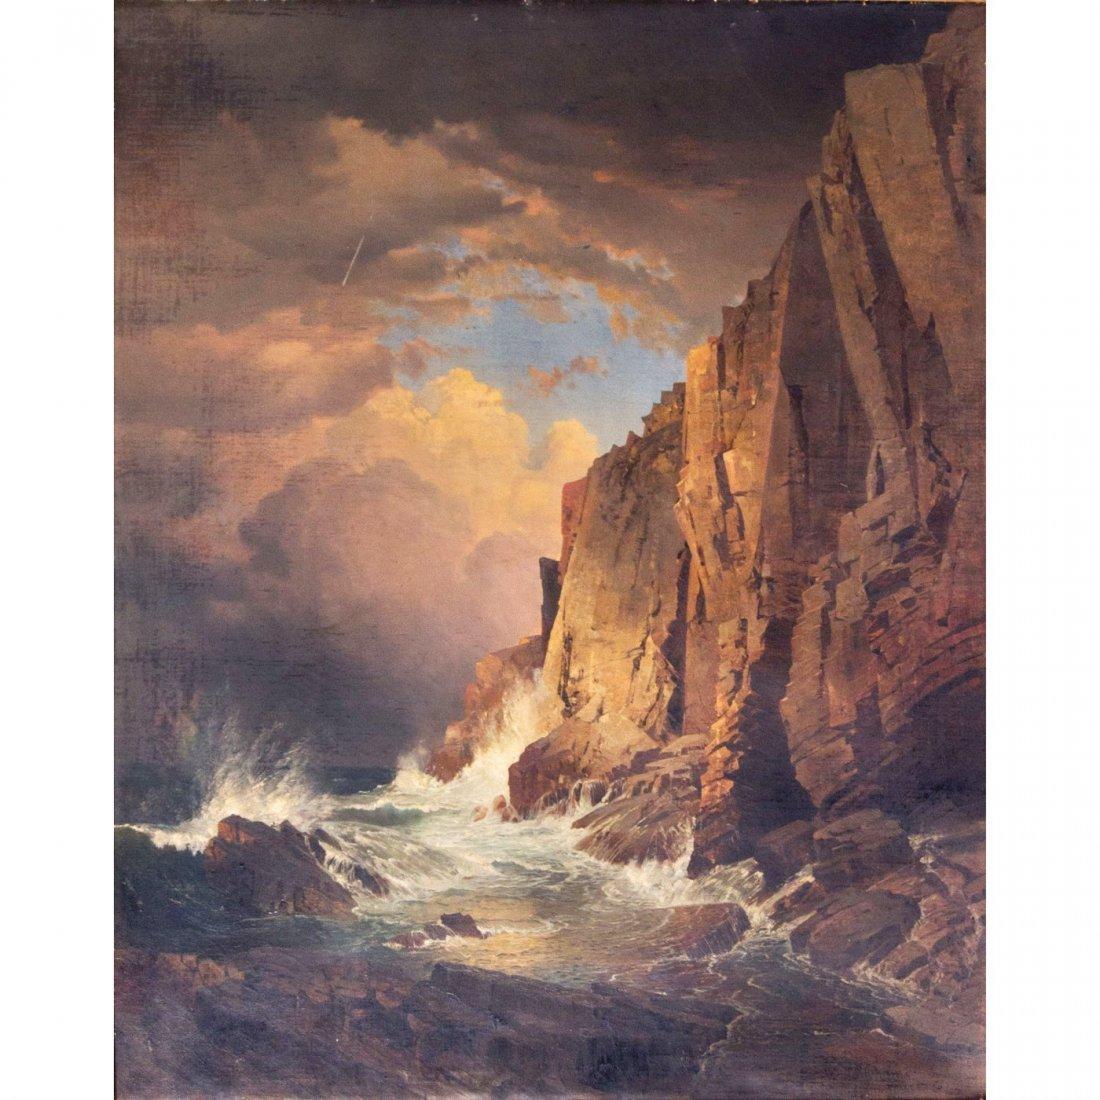 18: William Trost Richards (American, 1833-1905)